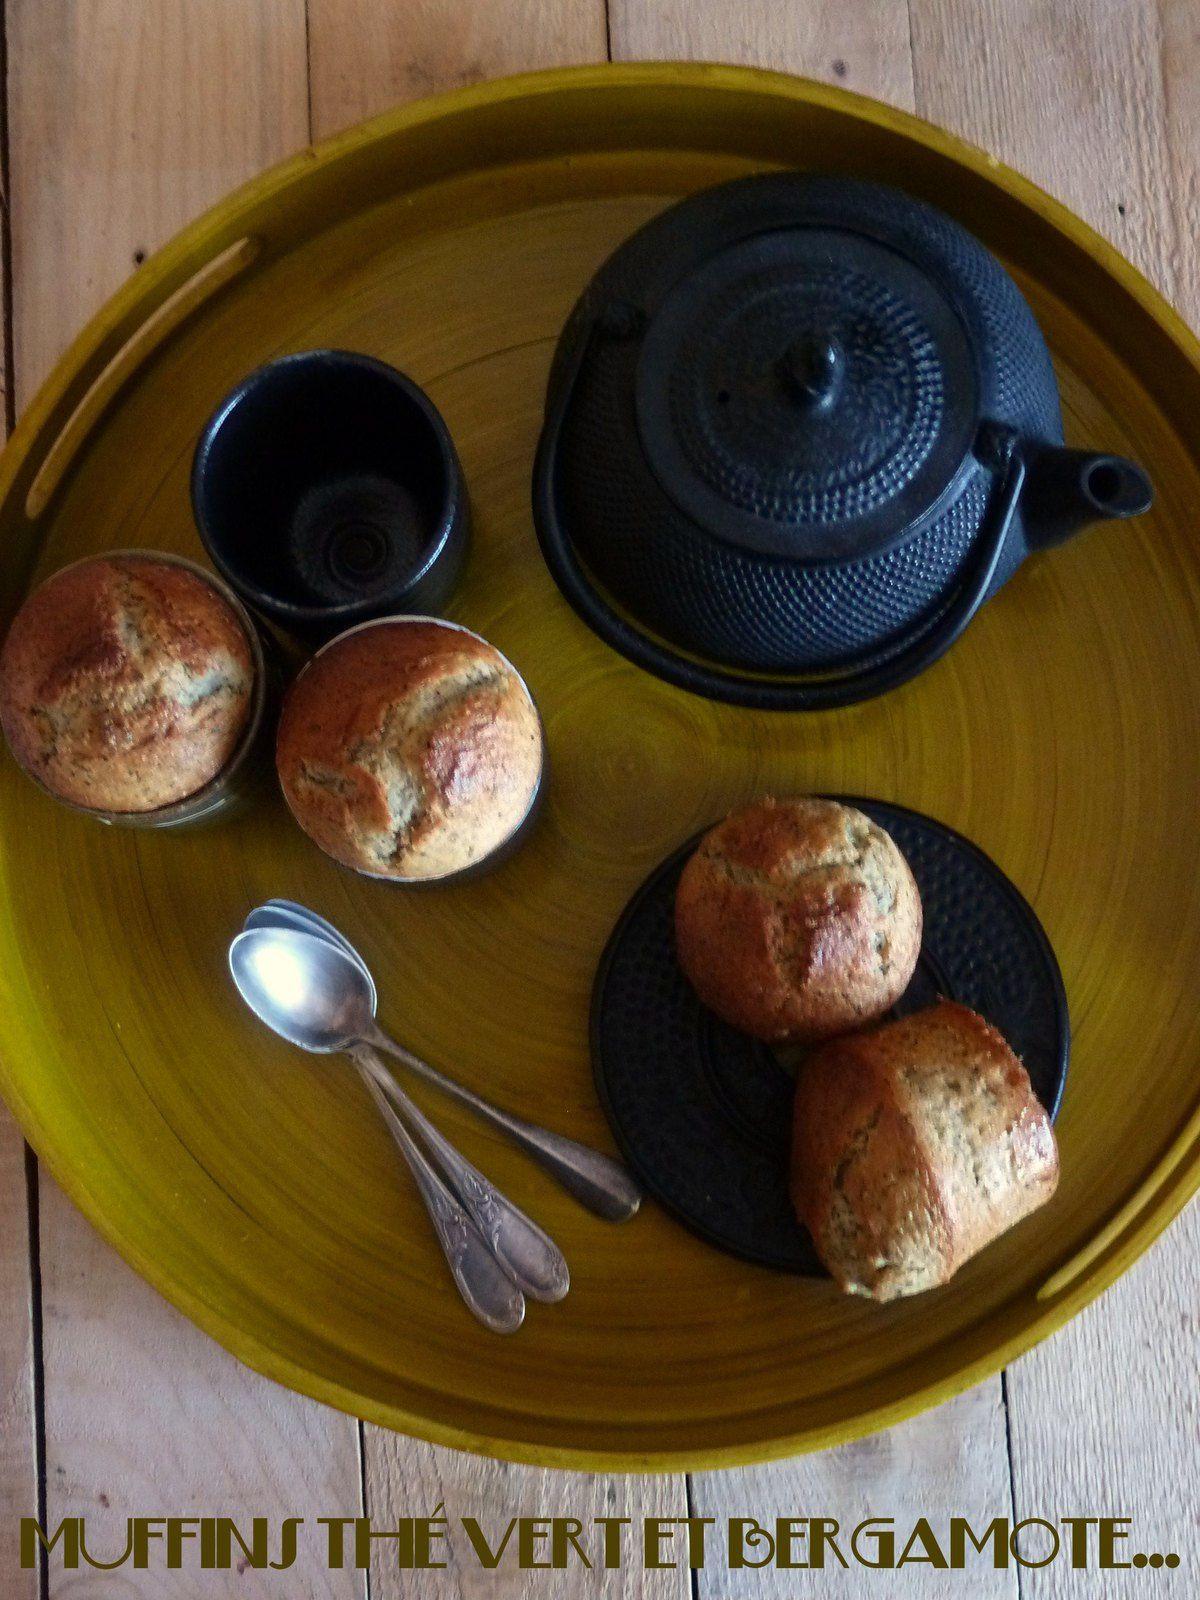 Muffins au thé vert et à la bergamote